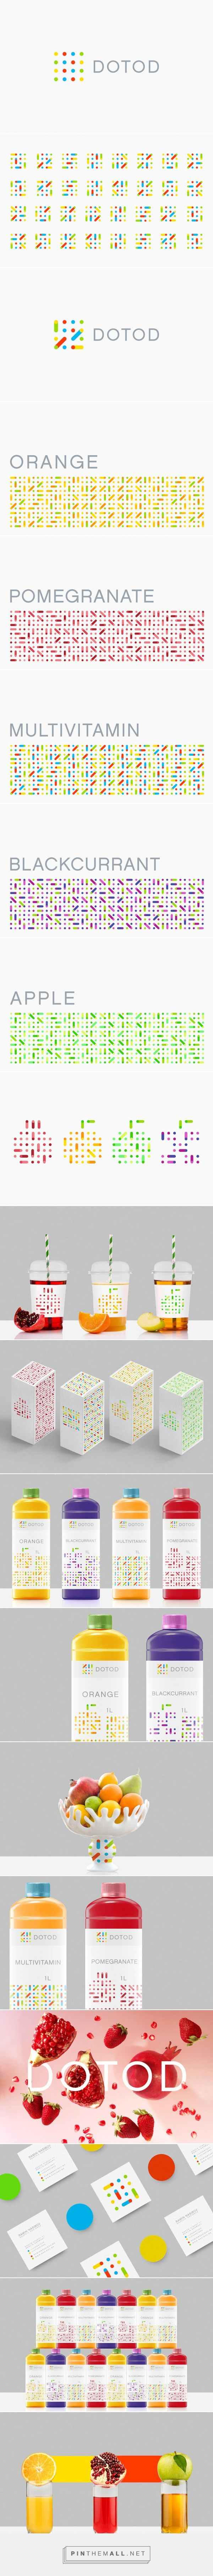 DOTOD #fruitjuice #packaging designed by Ramin Nasibov - http://www.packagingoftheworld.com/2015/07/dotod.html